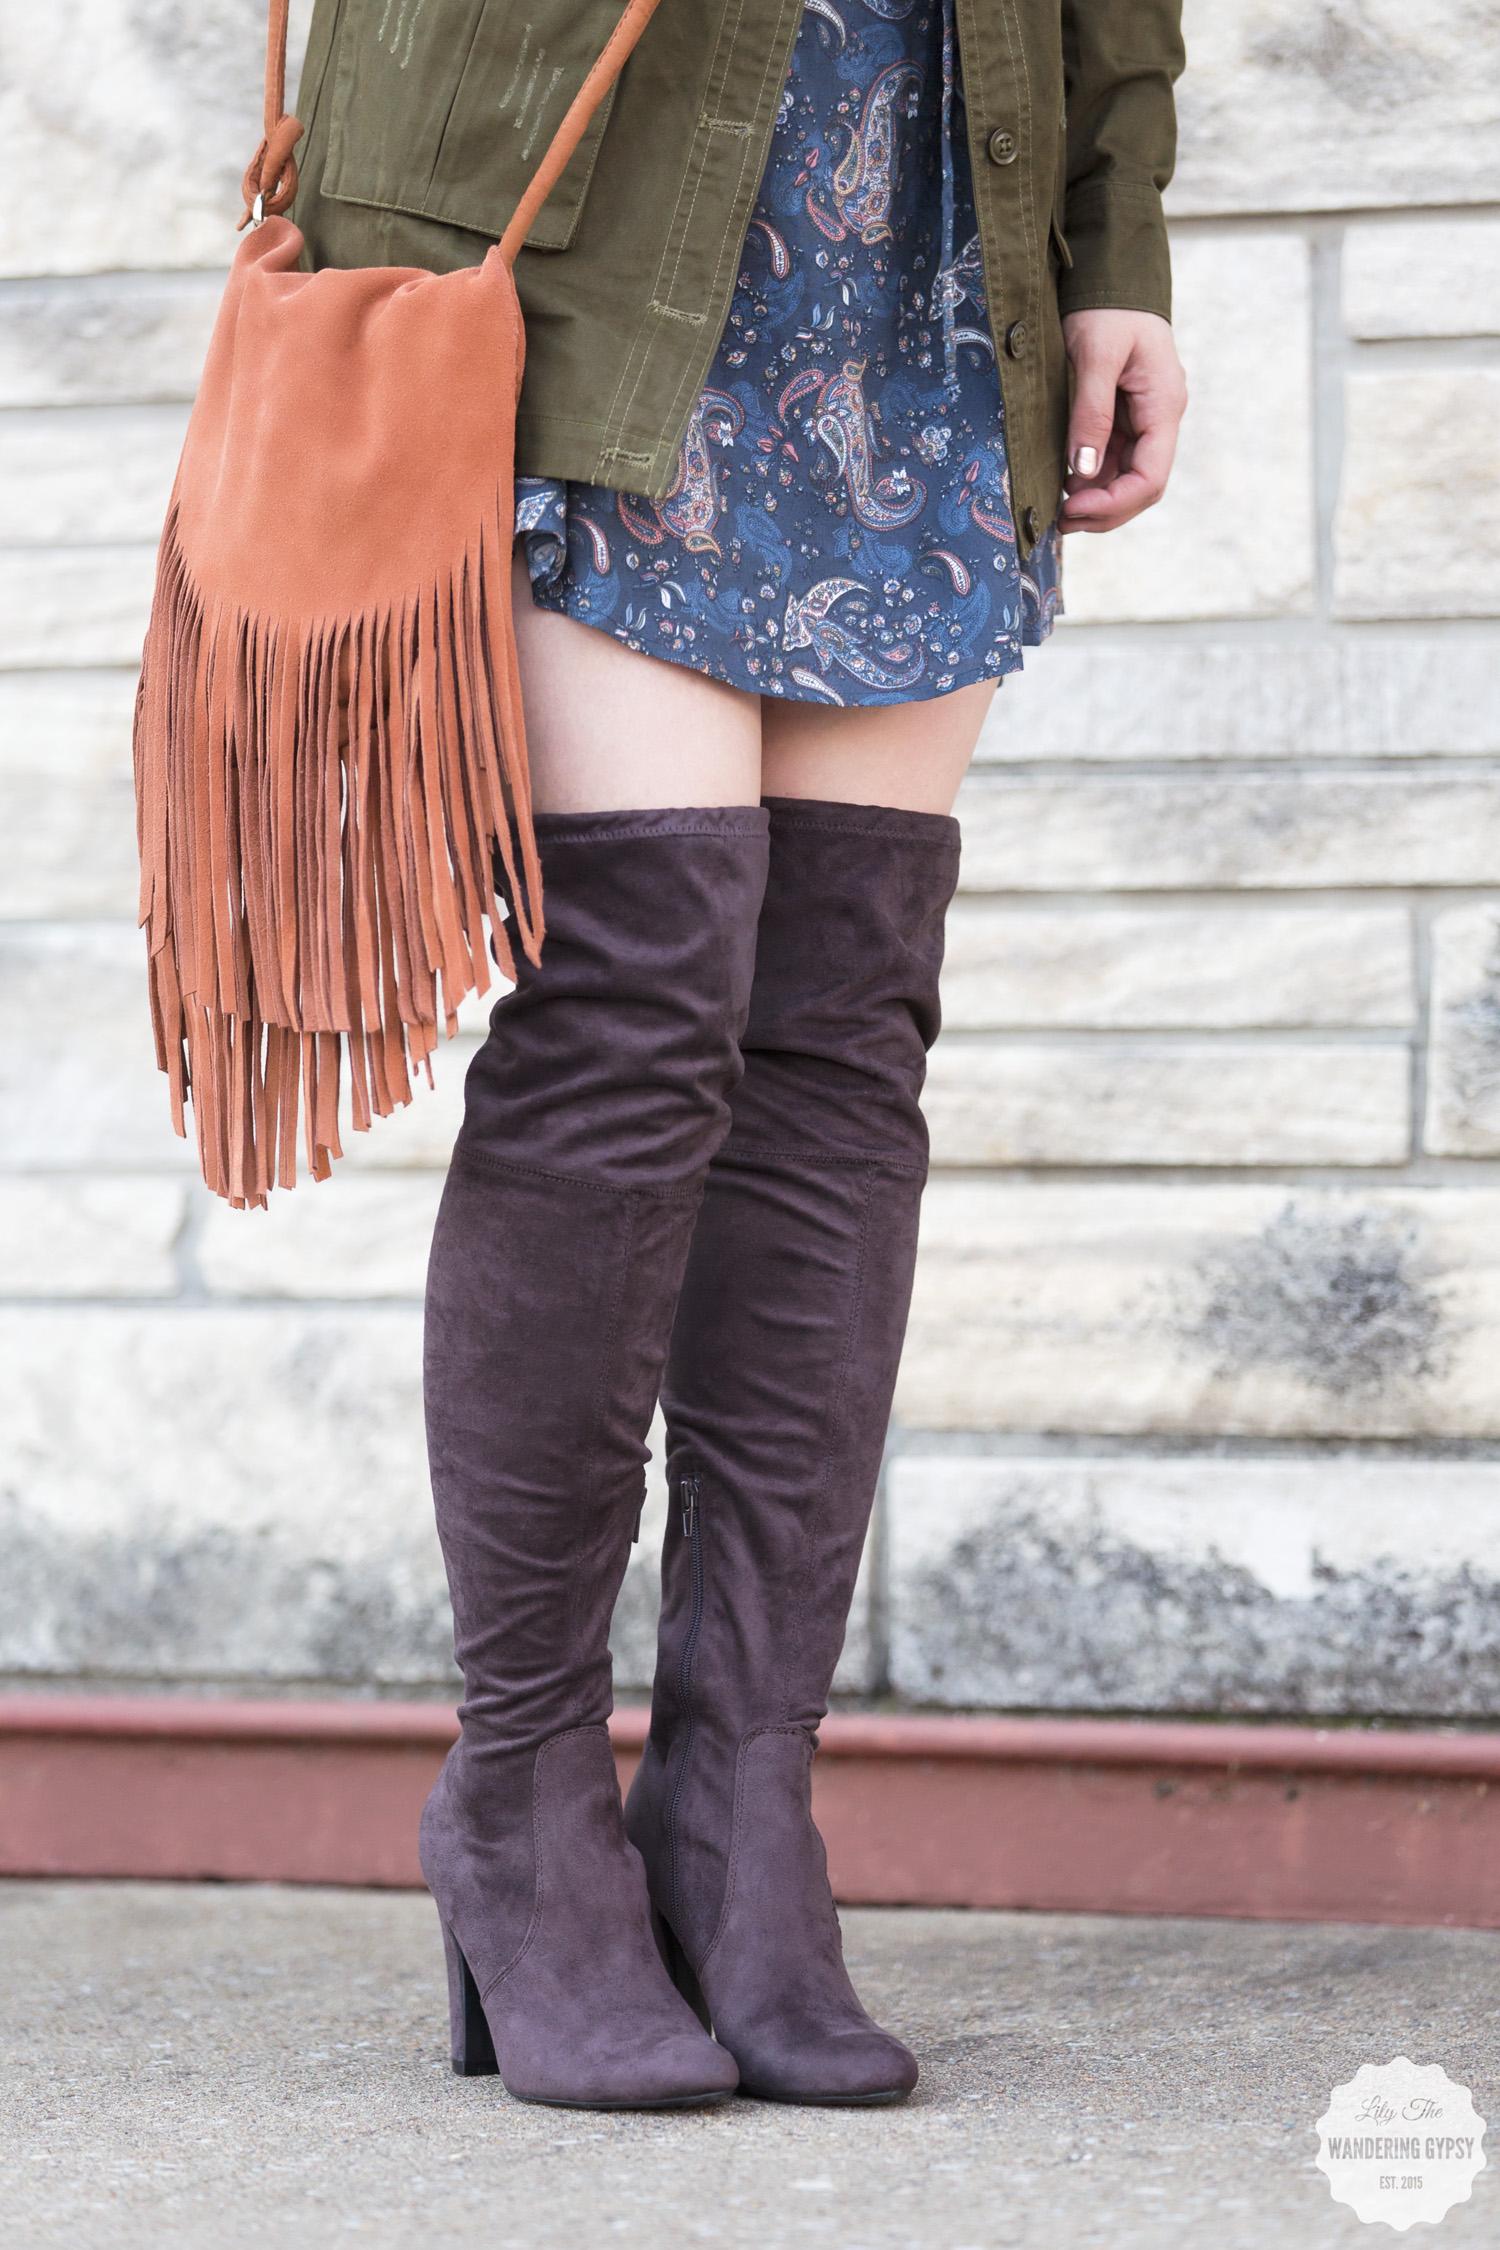 #MyDSW - over the knee boots, fringe purse, paisley dress, army jacket